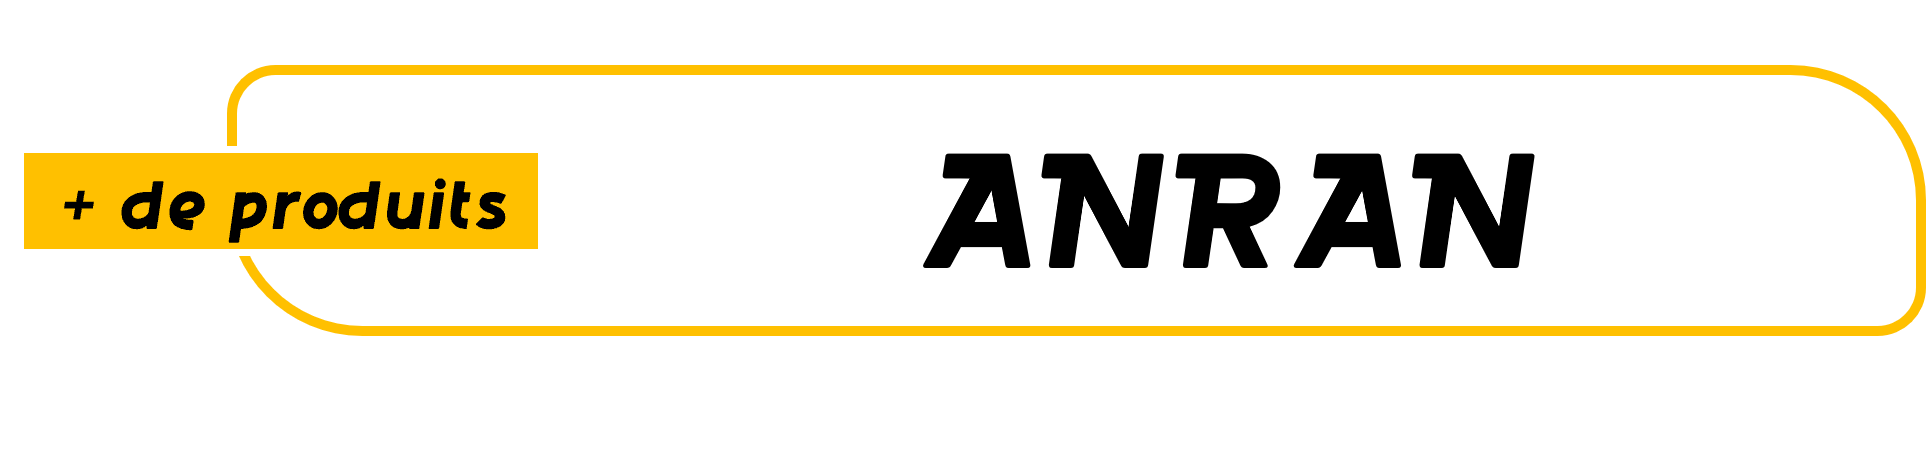 ANRAN